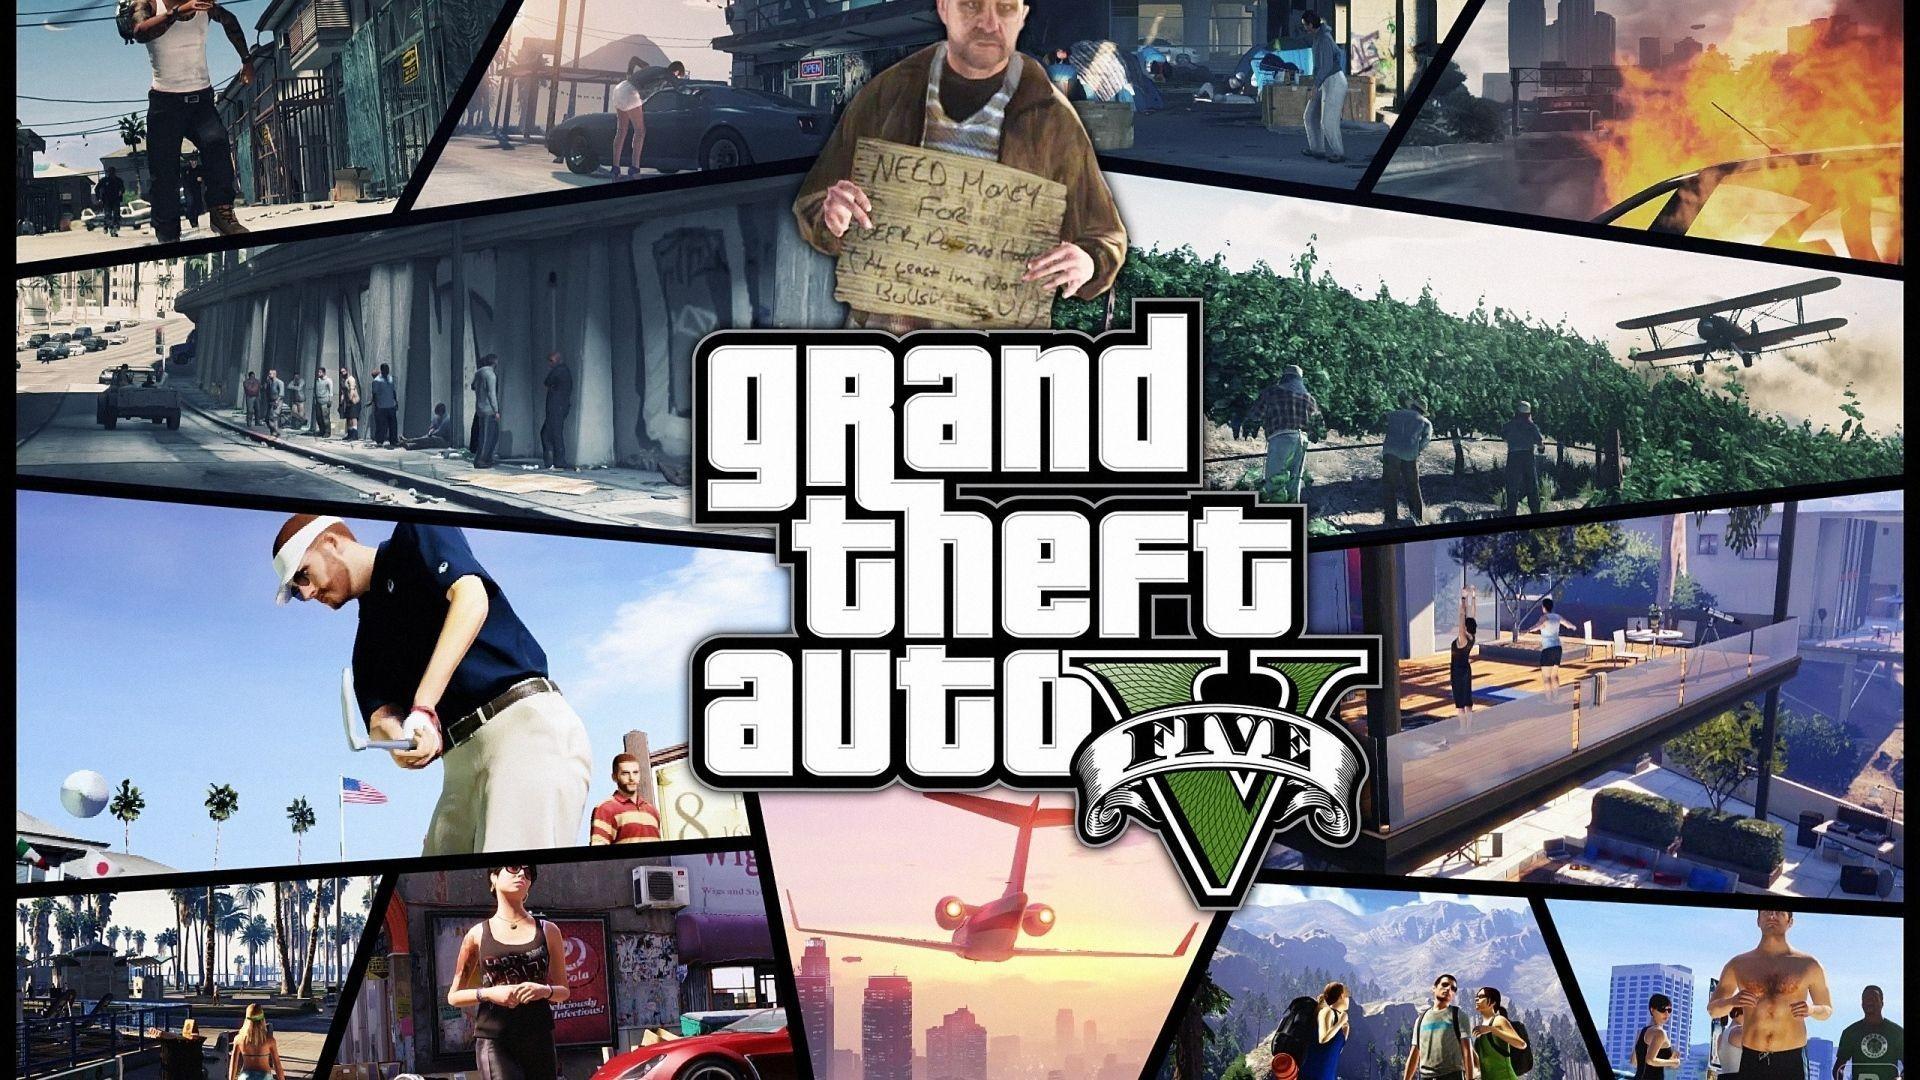 Download Wallpaper Gta, Grand theft auto 5, Photos .